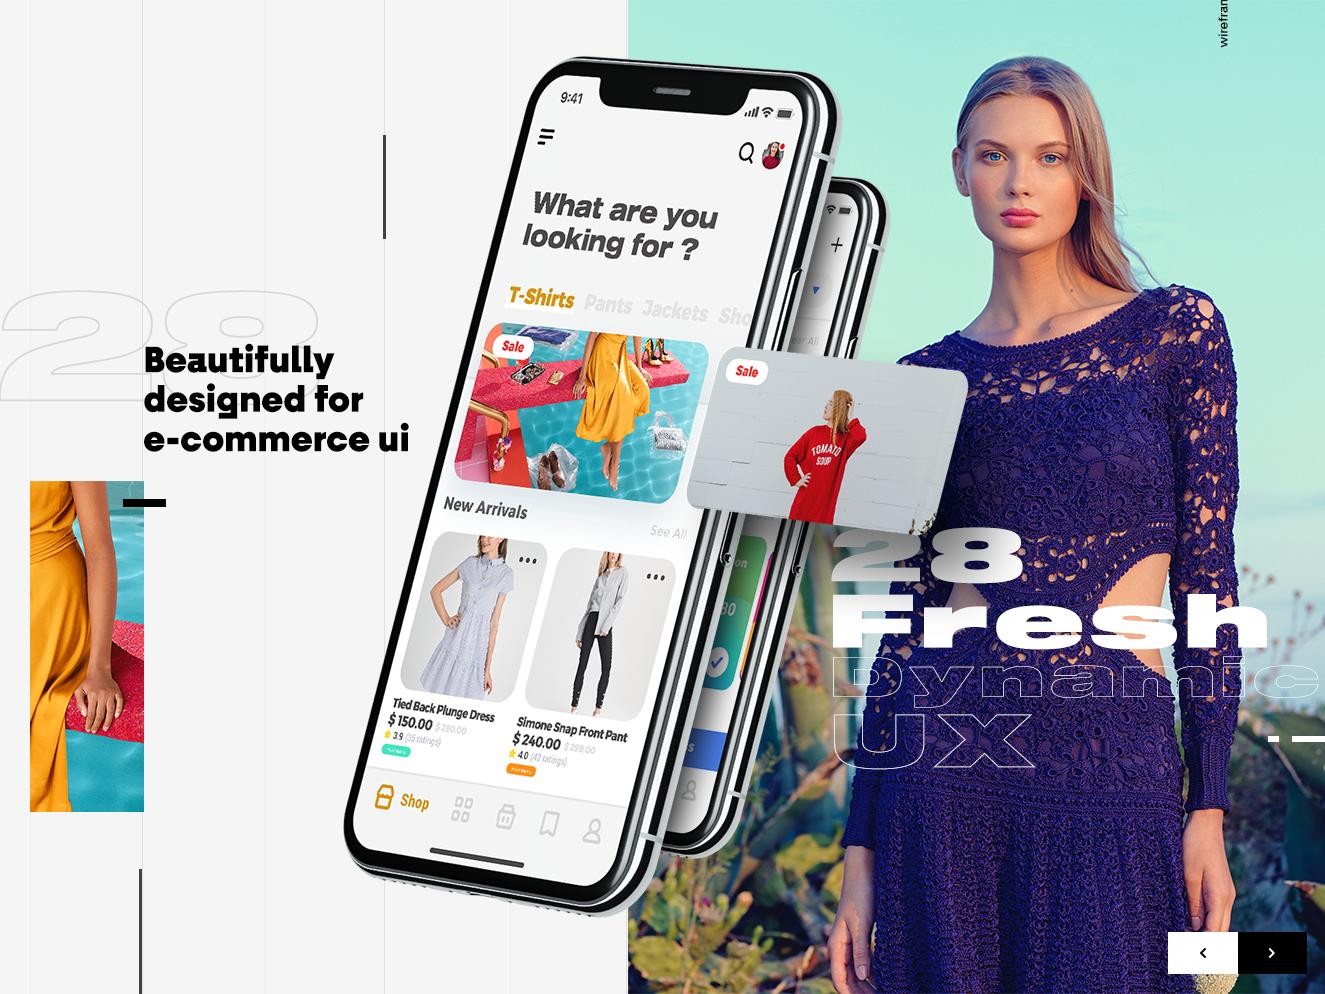 E commerce Ui App - She - soon💖⚡️ uxdesign xddailychallenge xd design ux design ecommerce ecommerce shop ecommerce design mobile app uiux ui design uidesign ui  ux ui